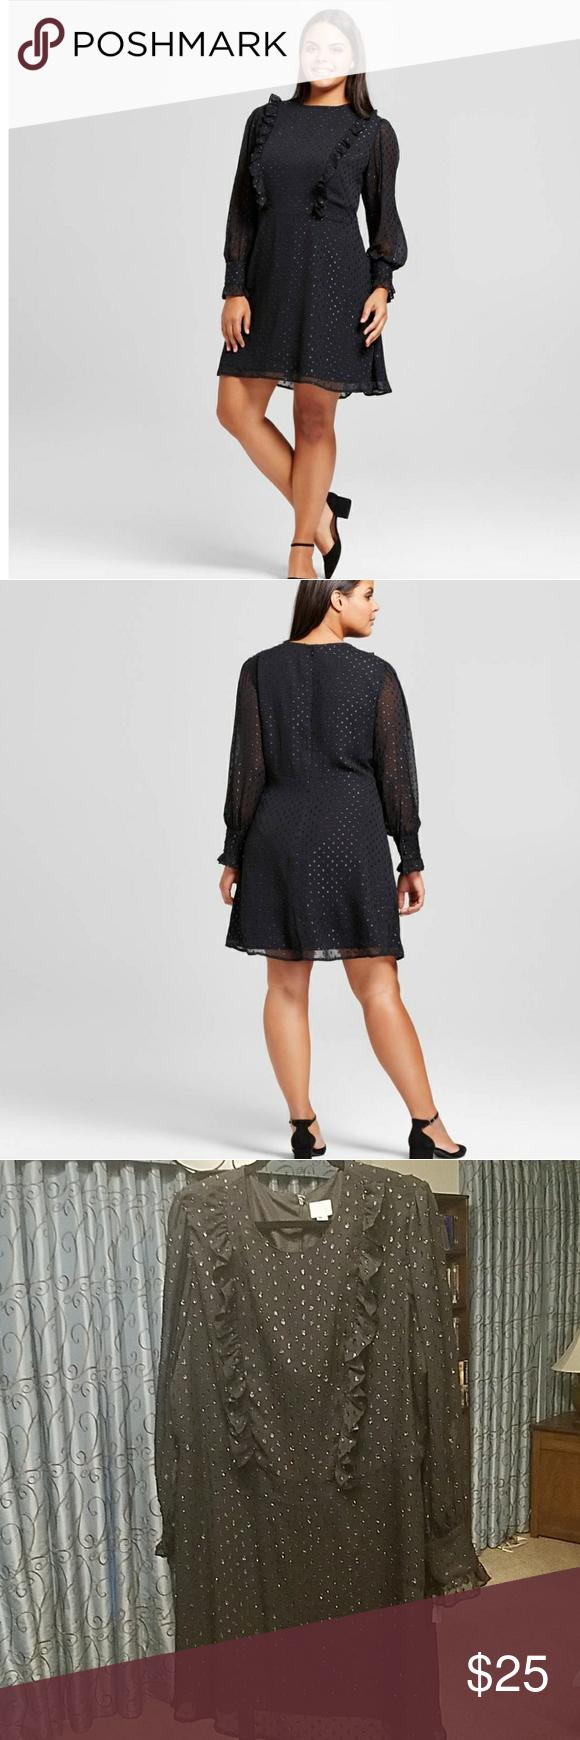 Cco Bottom Price Host Pick A N D Ruffle Dress Black Chiffon Dress Ruffle Dress Long Sleeve Ruffle Dress [ 1740 x 580 Pixel ]